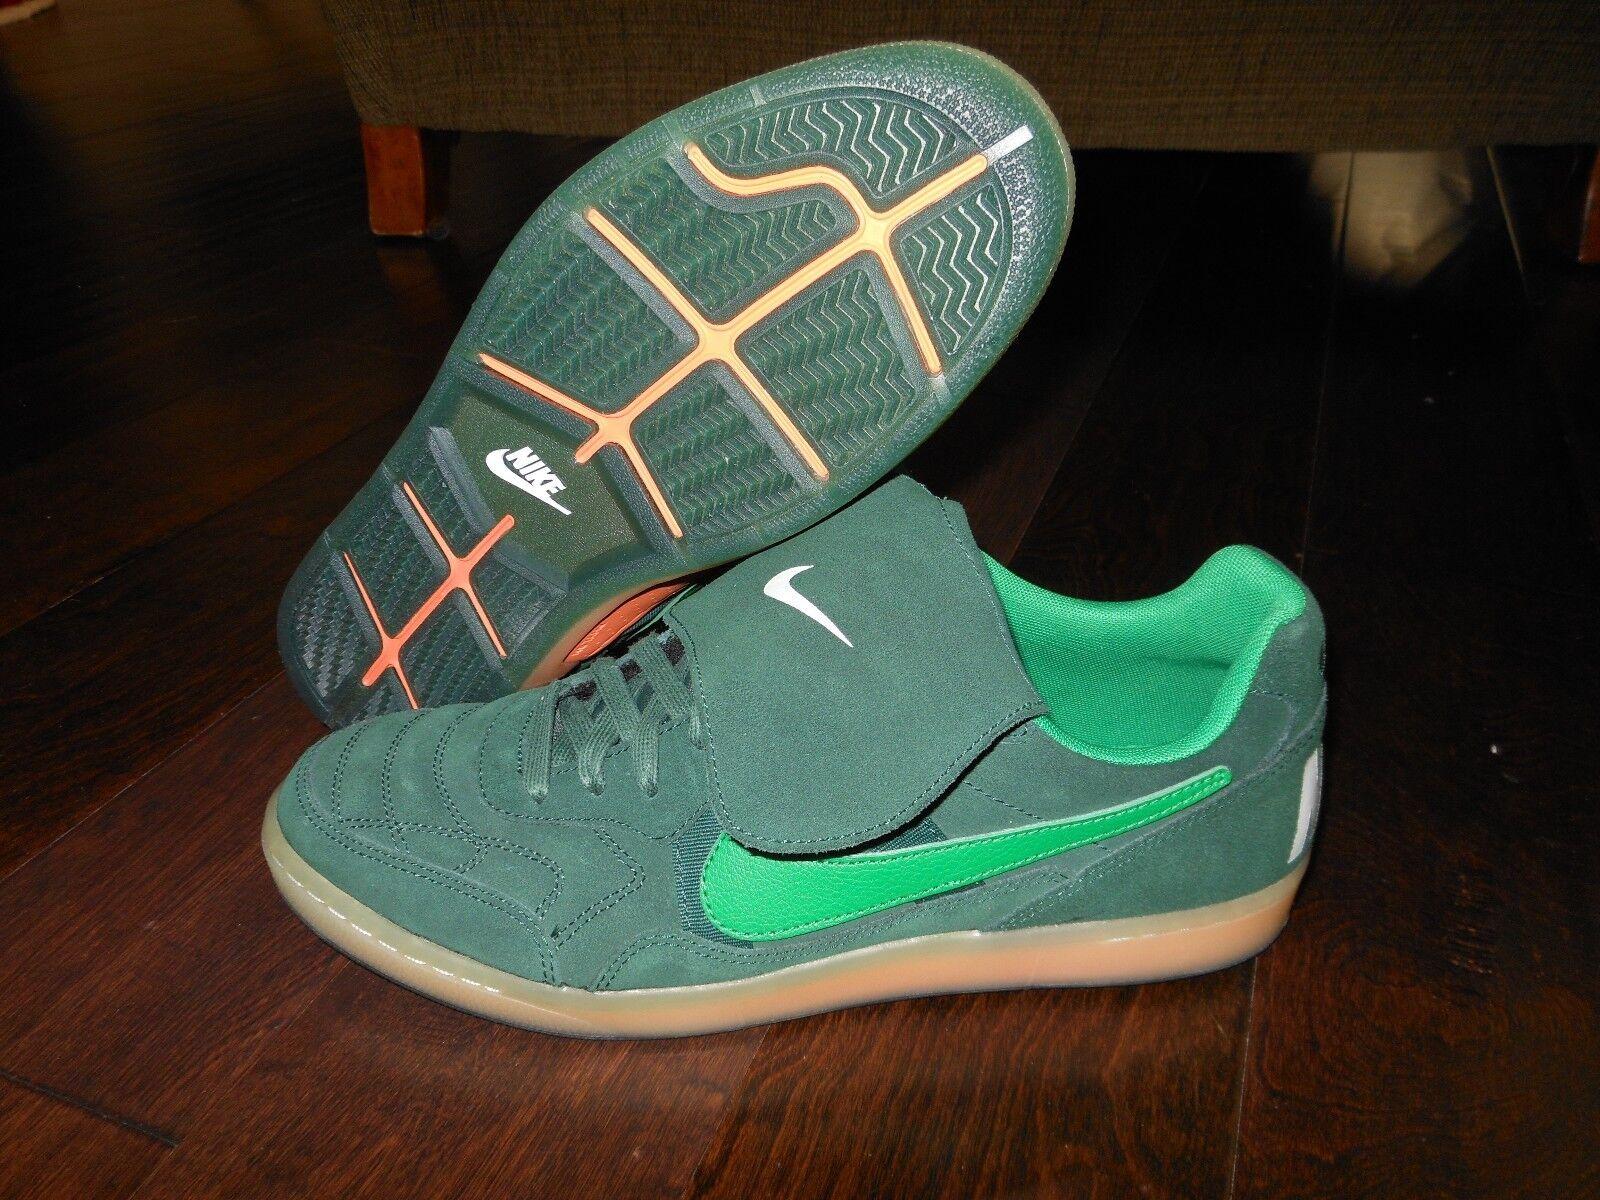 NIKE 631689-338 NSW TIEMPO 94 PREMIER 631689-338 NIKE Soccer Shoes Size 11 US 45 EUR Green c6af7e